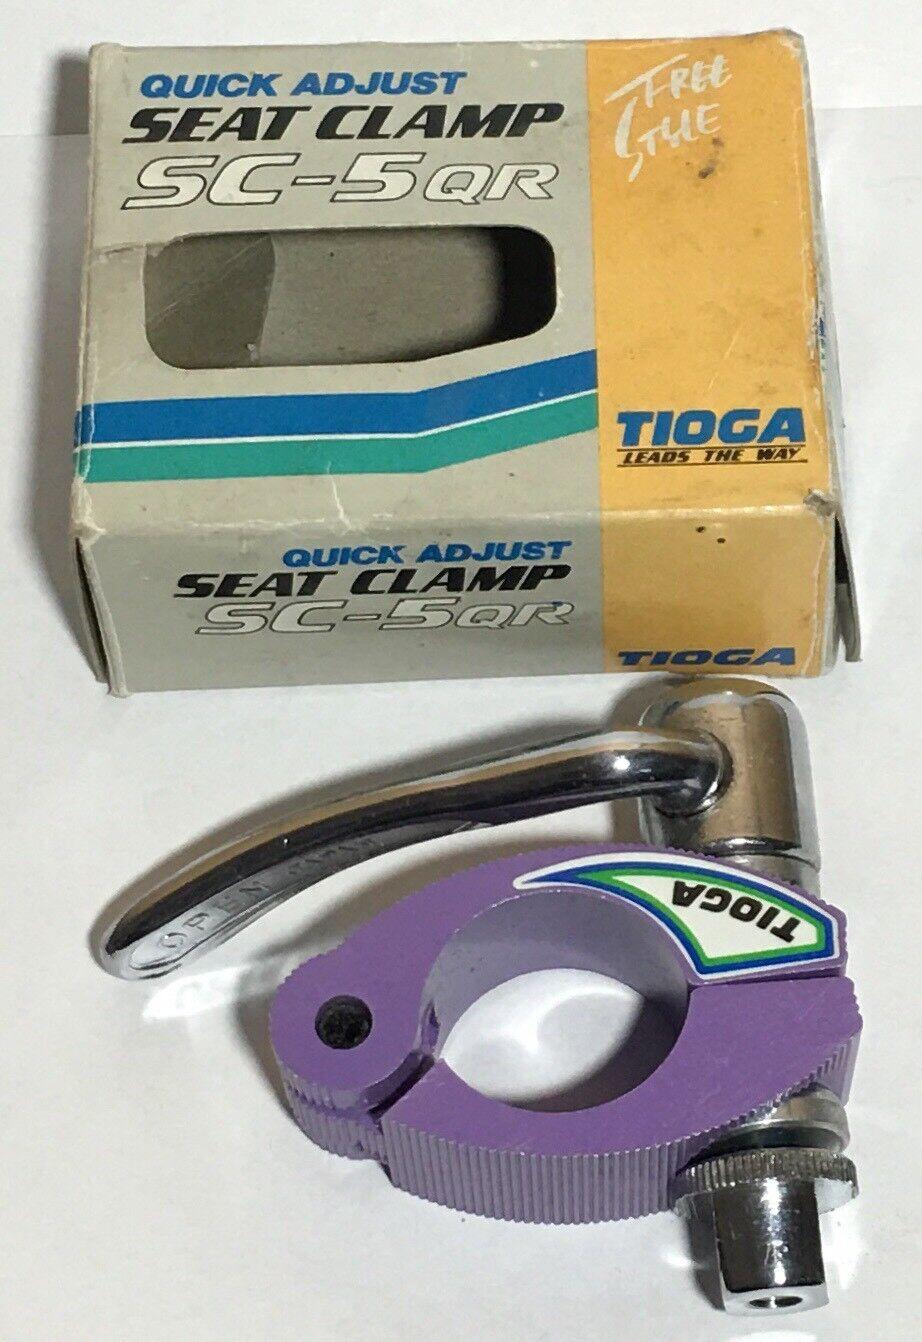 Vintage nuevo viejo stock Tioga SC-5QR Ajuste Rápido Abrazadera del asiento-Raro púrpura